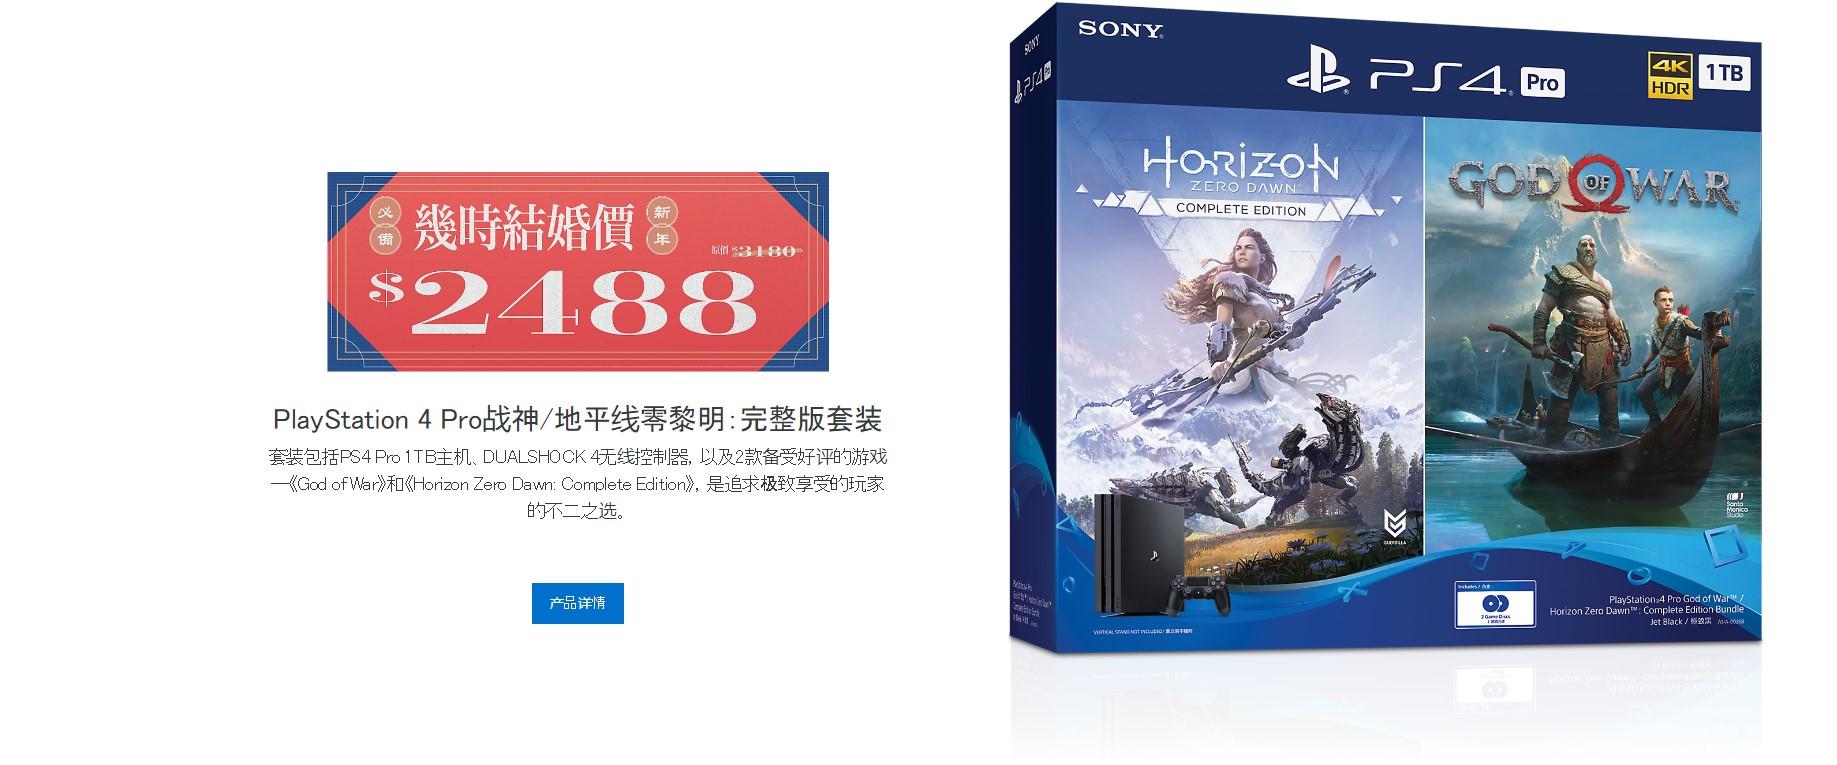 PS港服春节特惠:PS4+神海4+战神4+地平线仅1760元